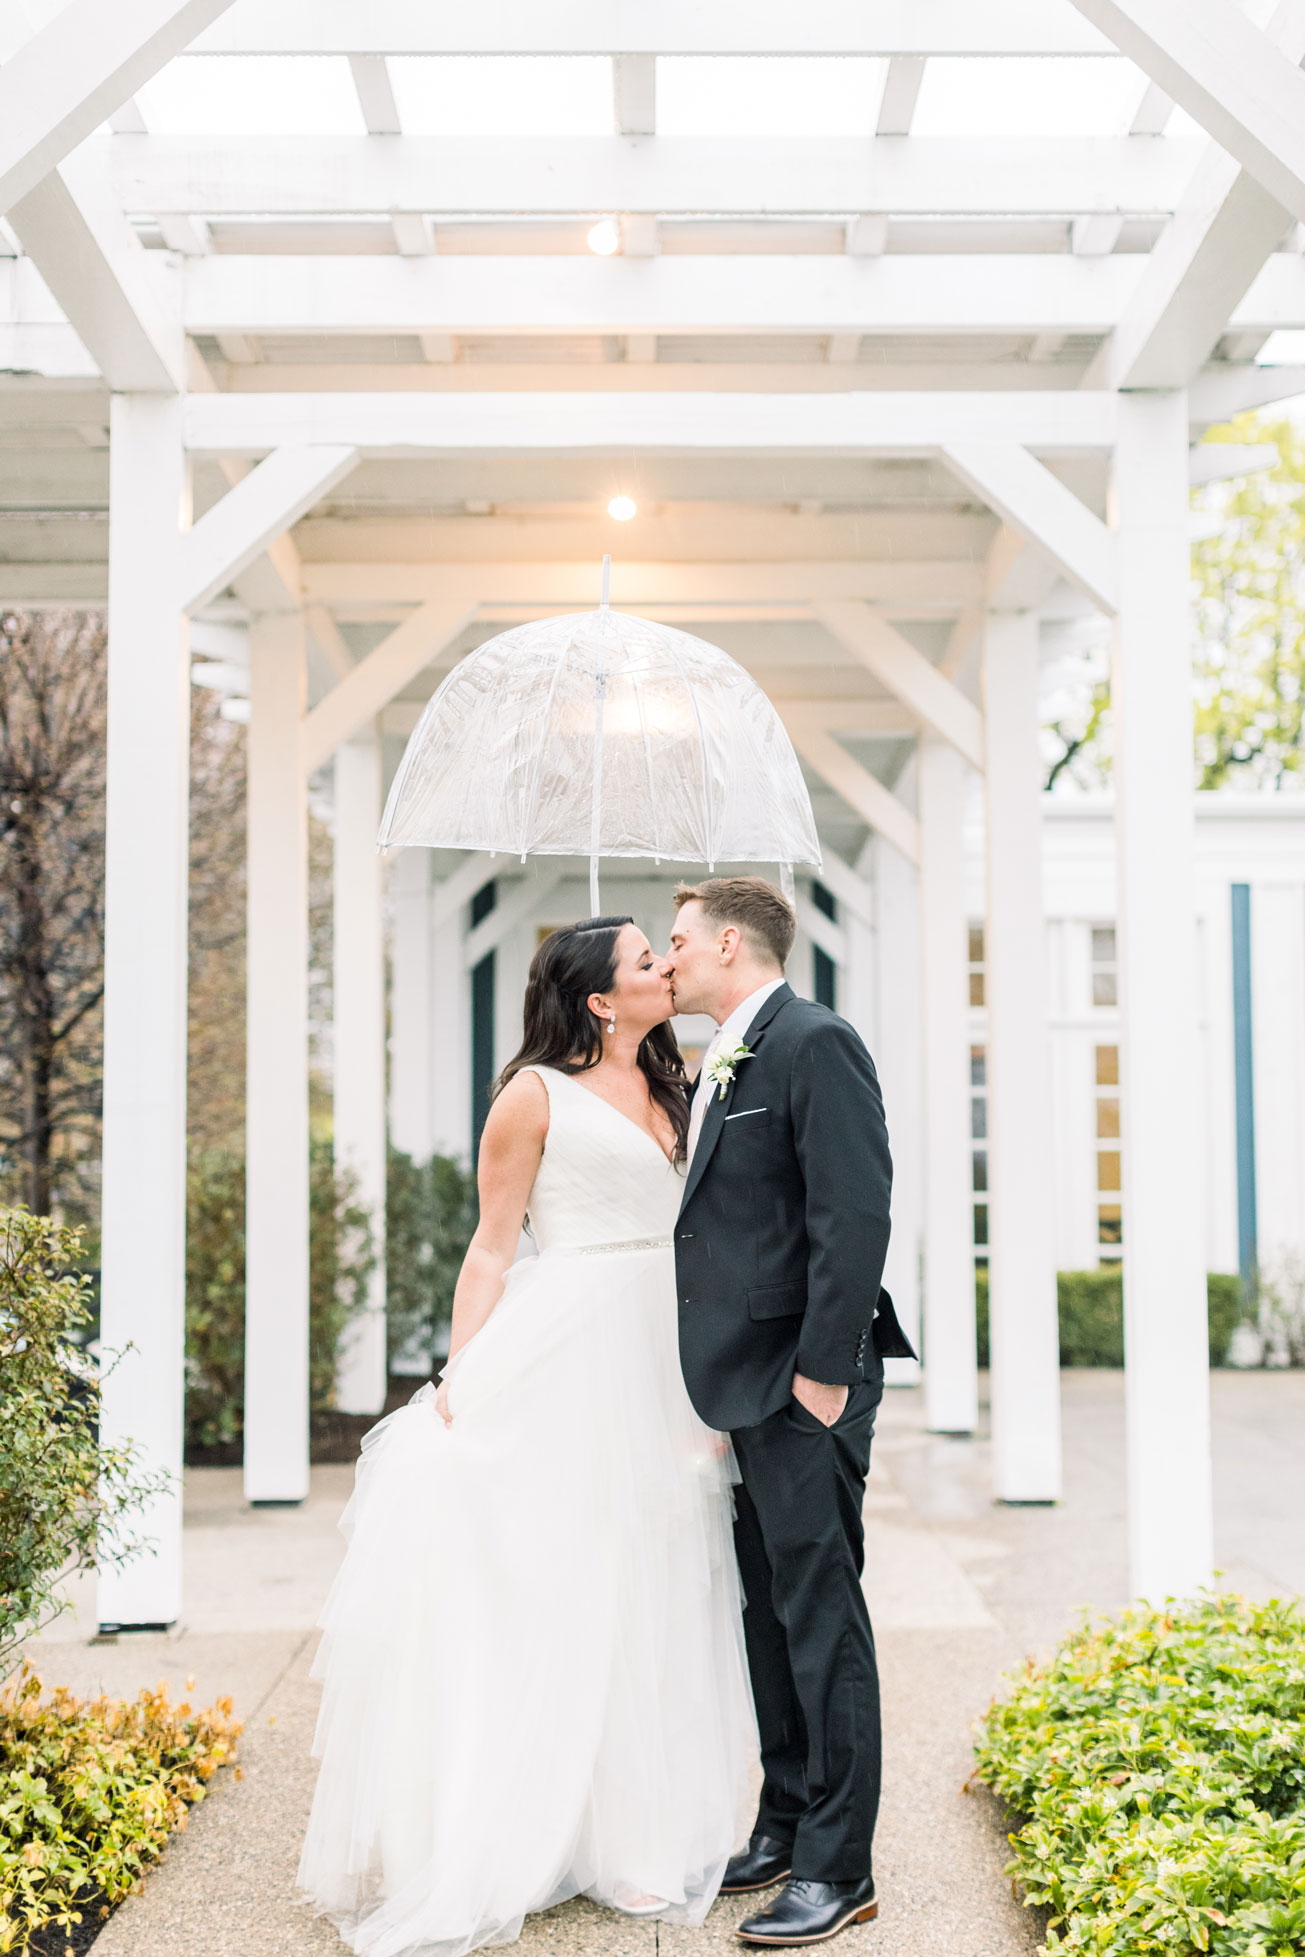 Konz-Bigaila-wedding-2017-122.jpg